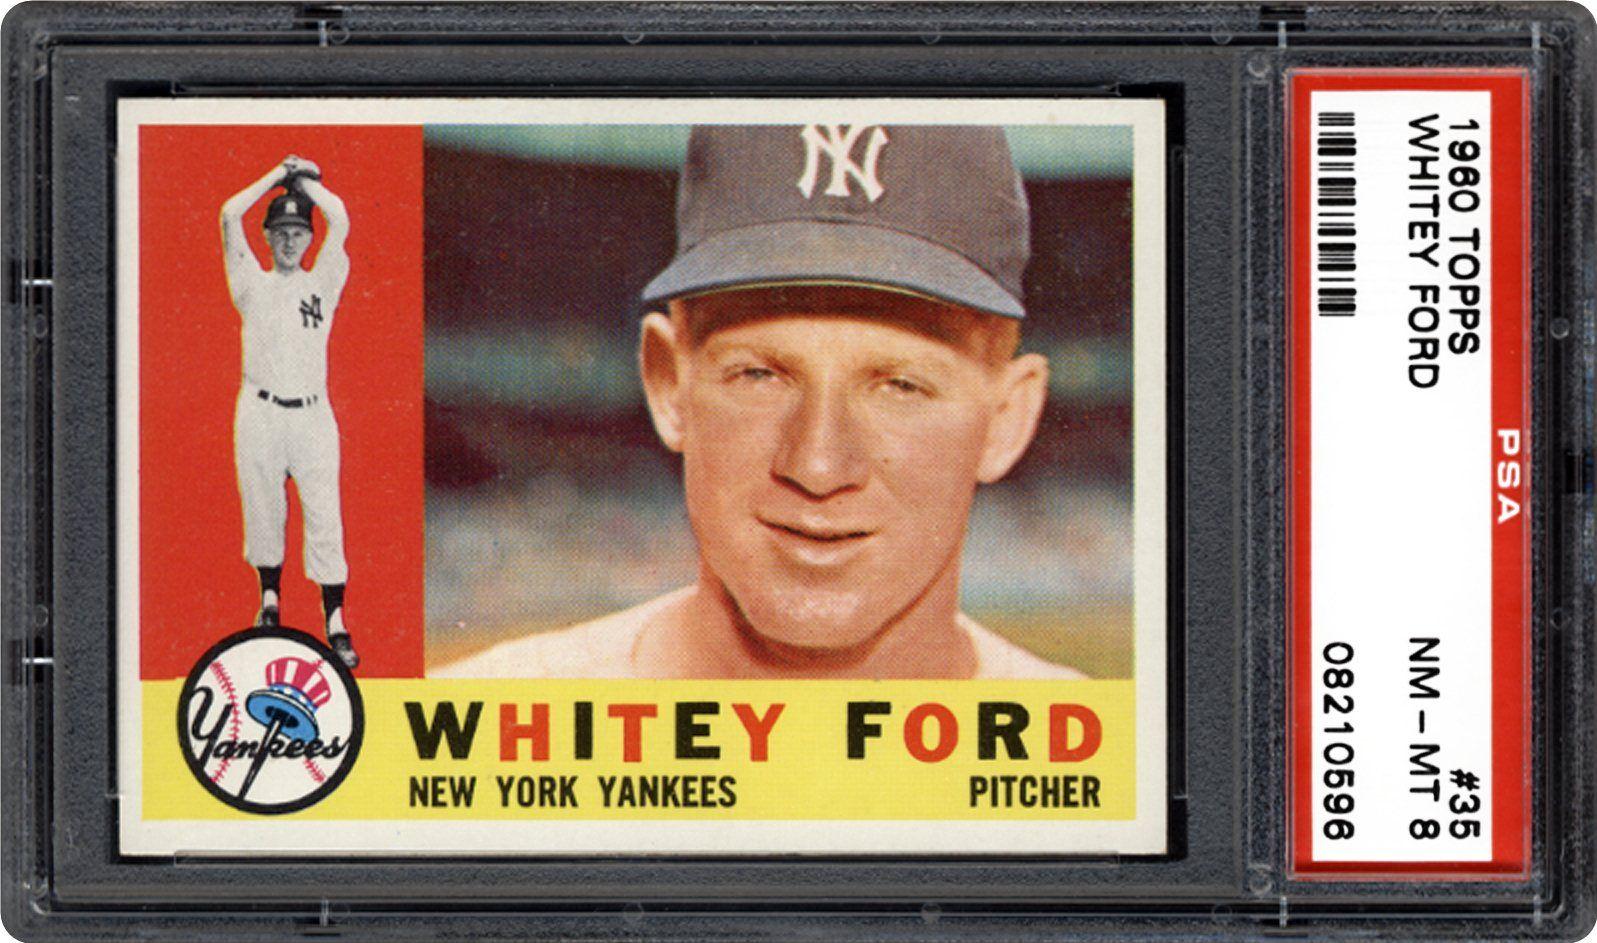 Whitey Ford  Wikipedia